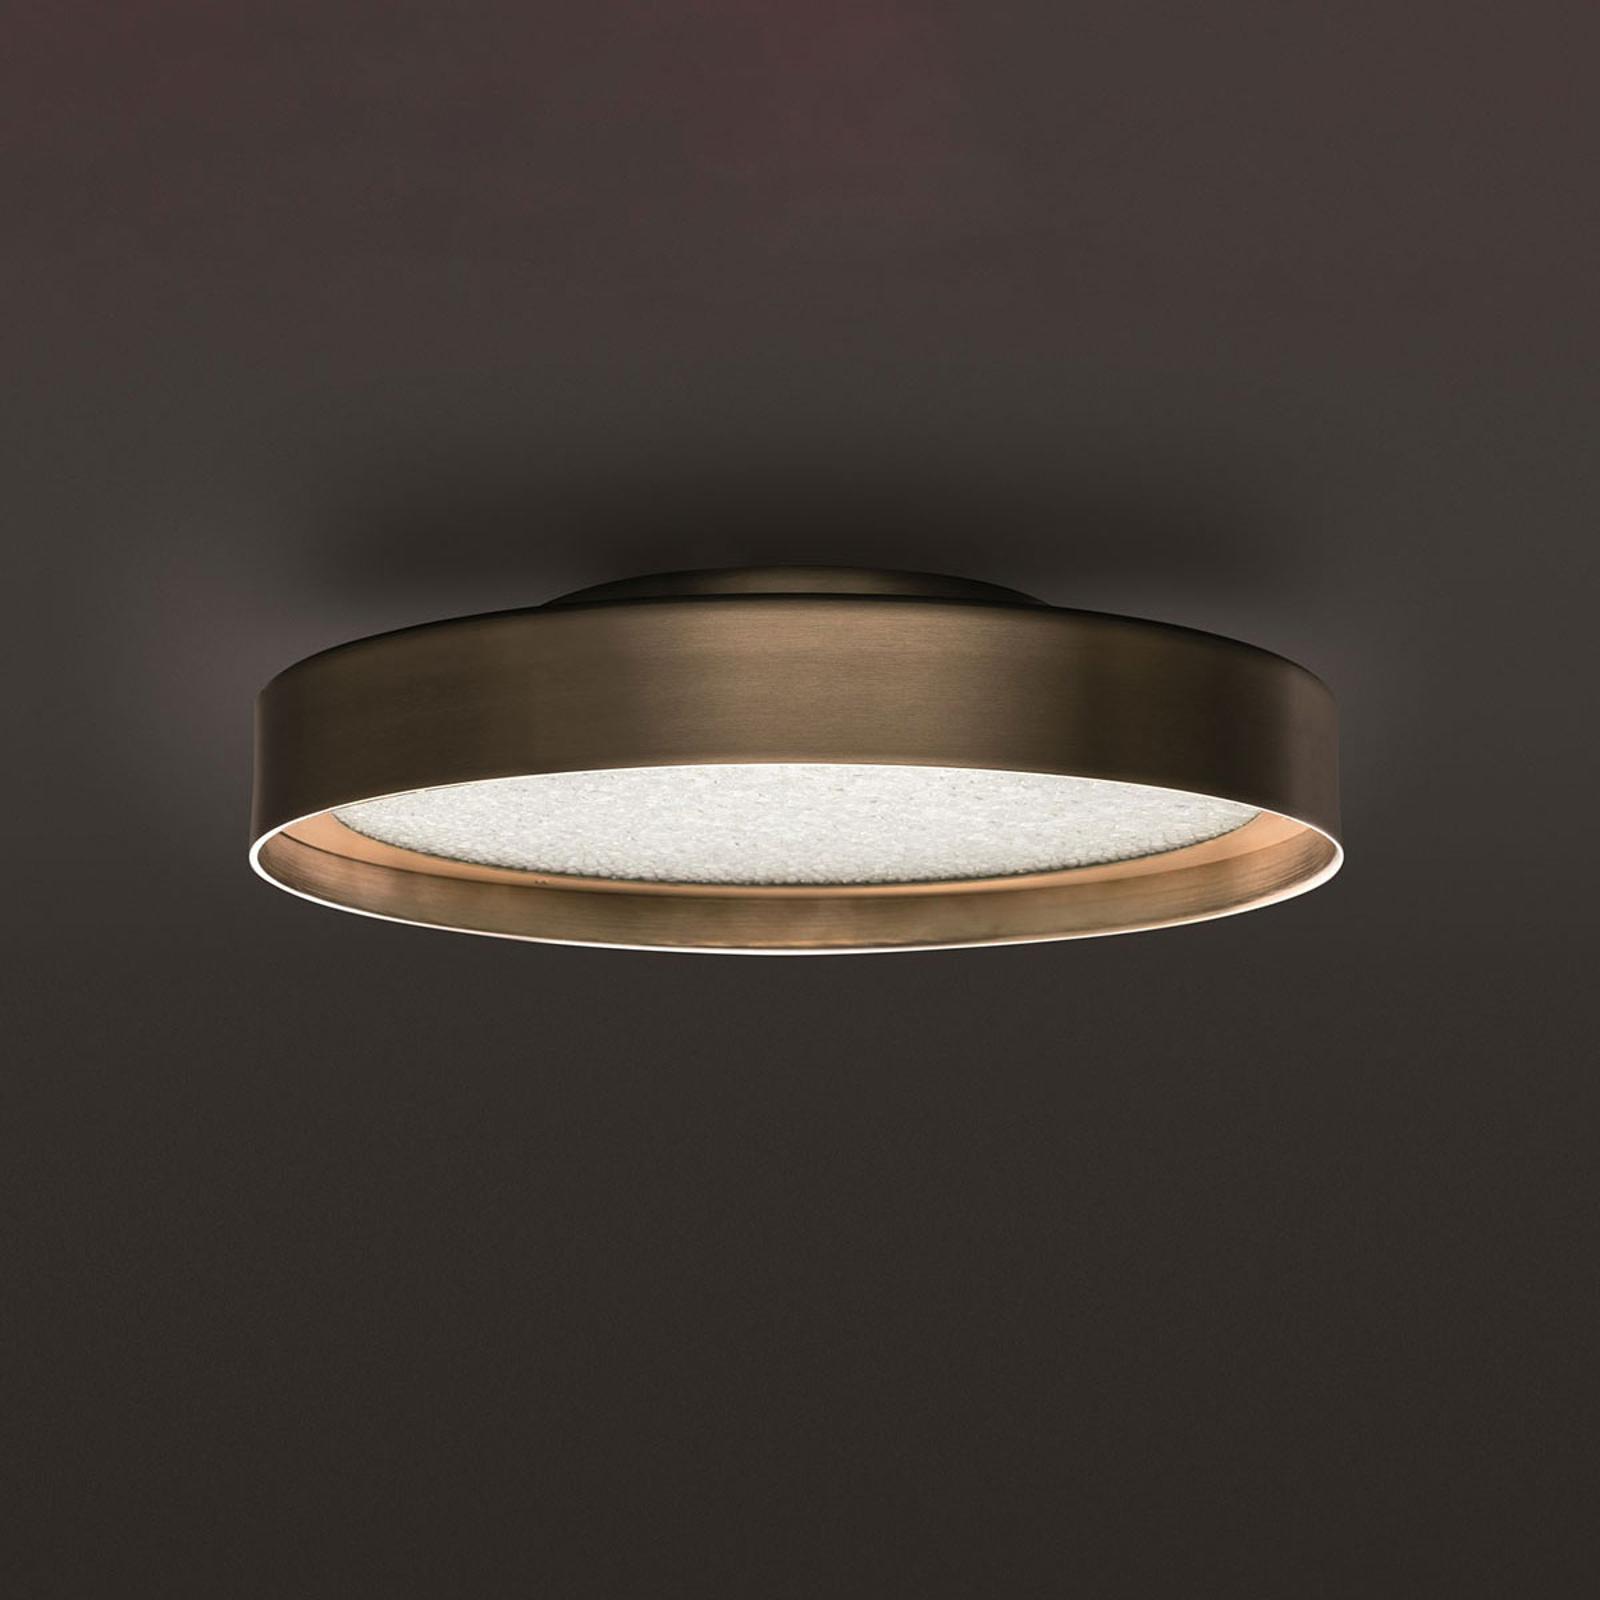 Oluce Berlin taklampe, diameter 30 cm